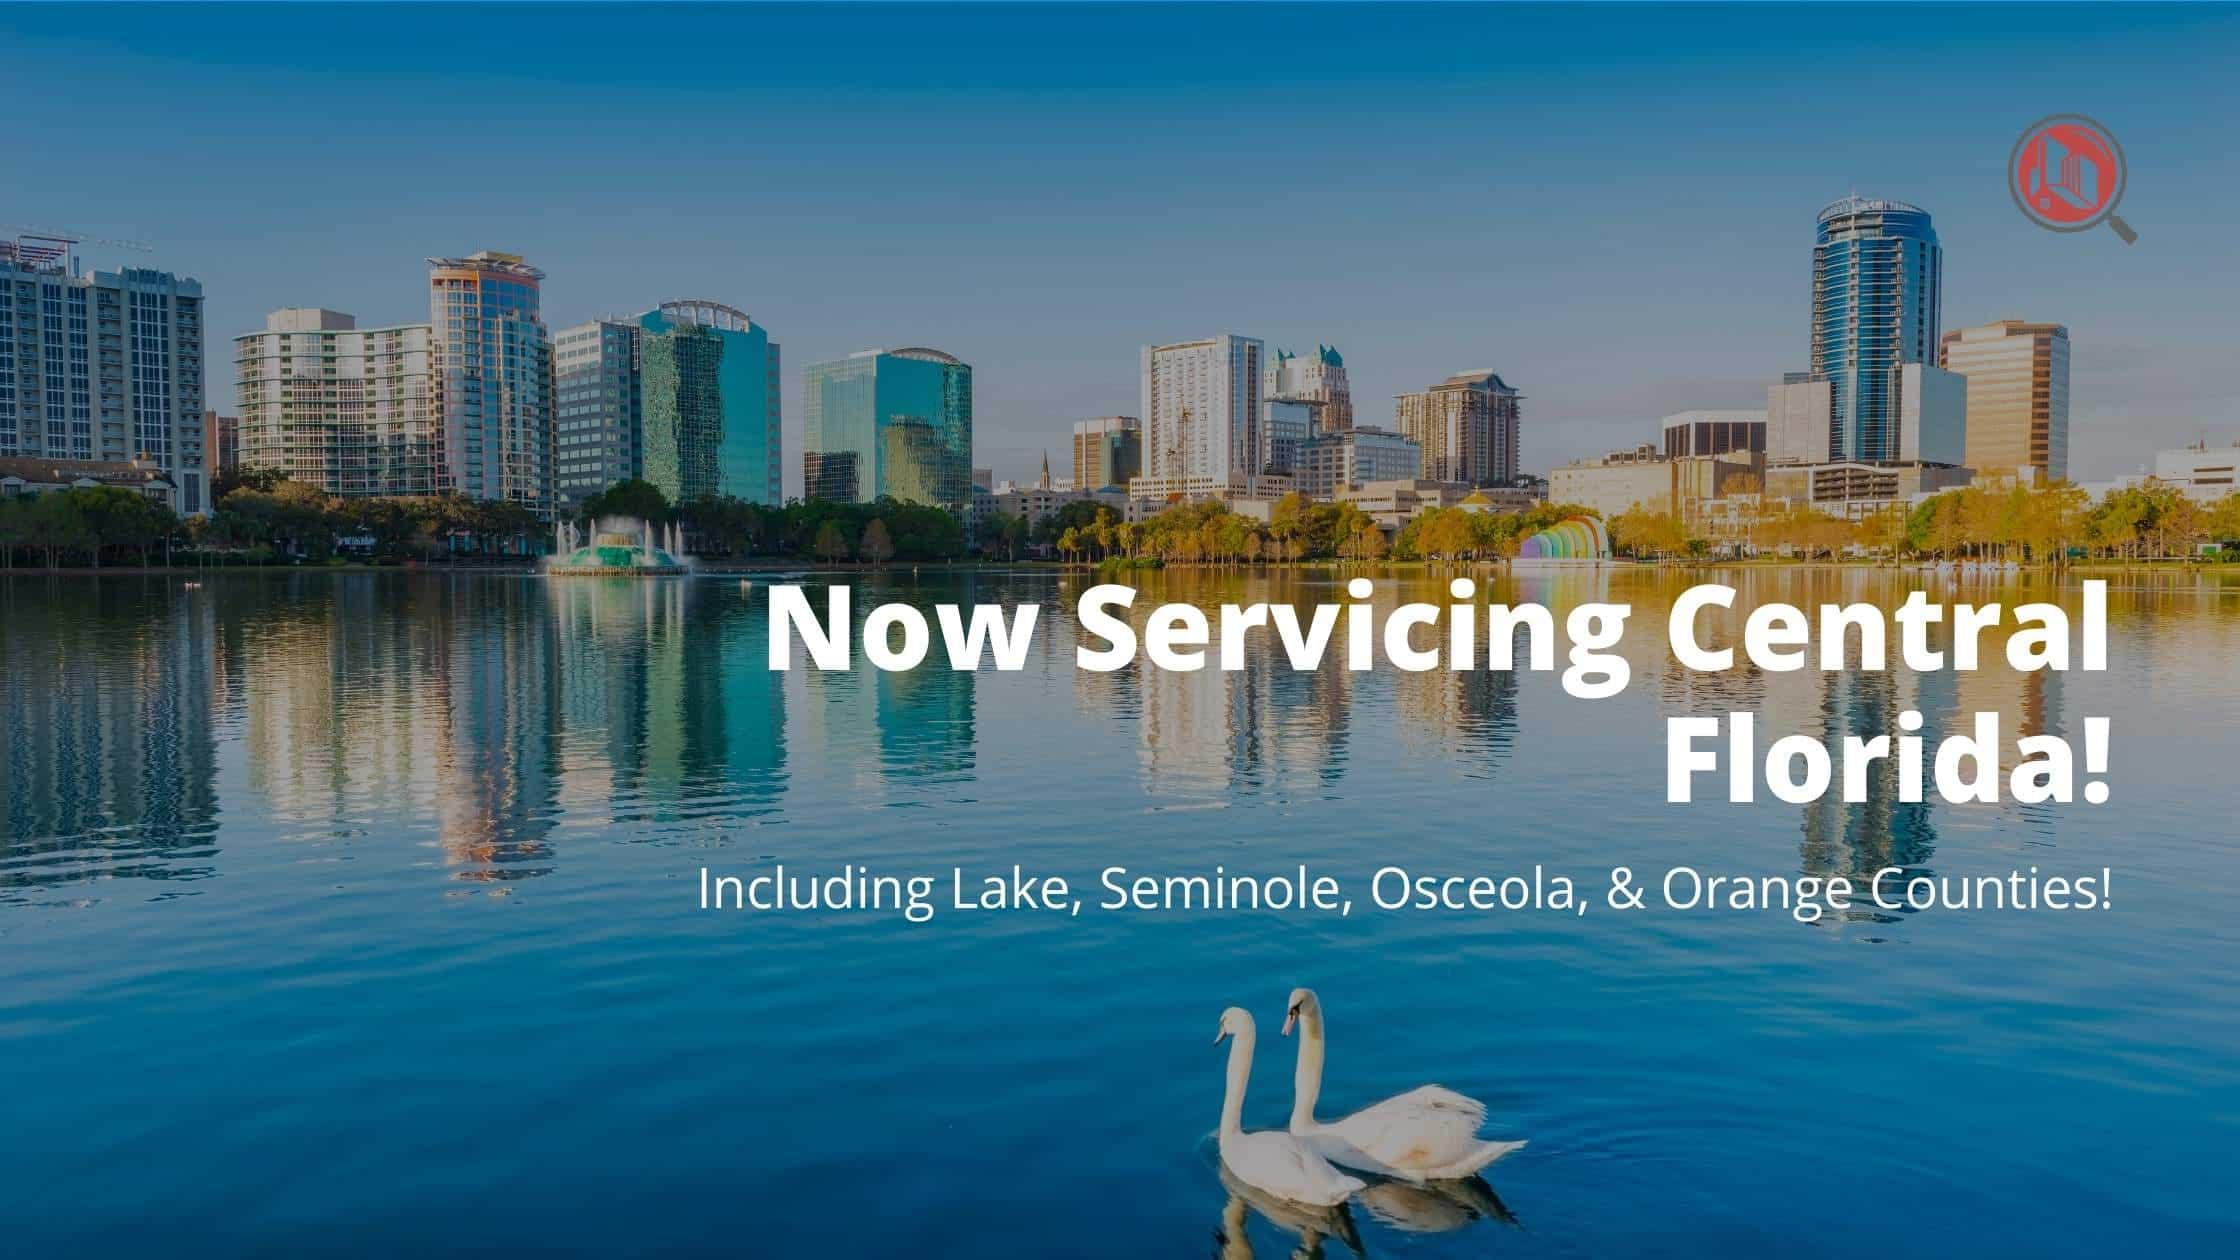 Now Servicing Central Florida (Blog Banner)